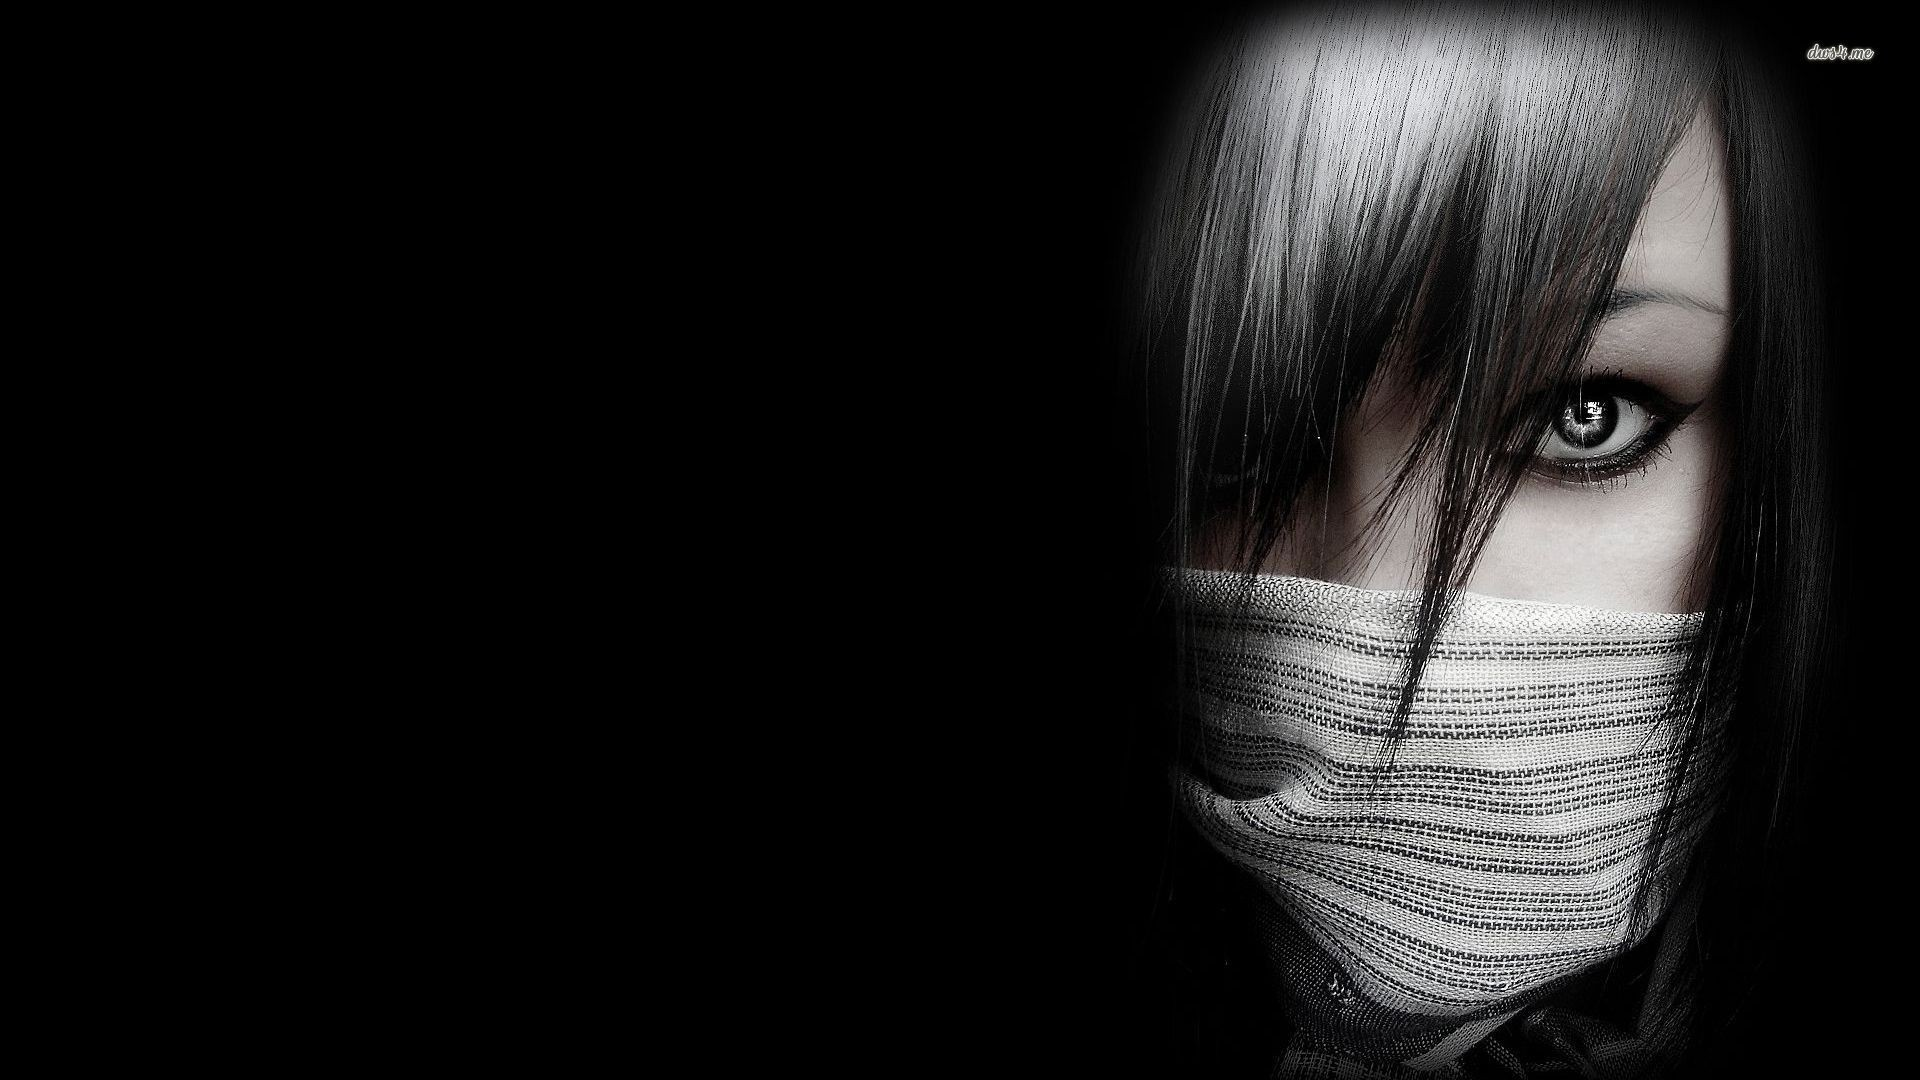 1920x1080 1920x1080 Emo girl in the shadows Digital Art HD desktop wallpaper, Woman wallpaper,